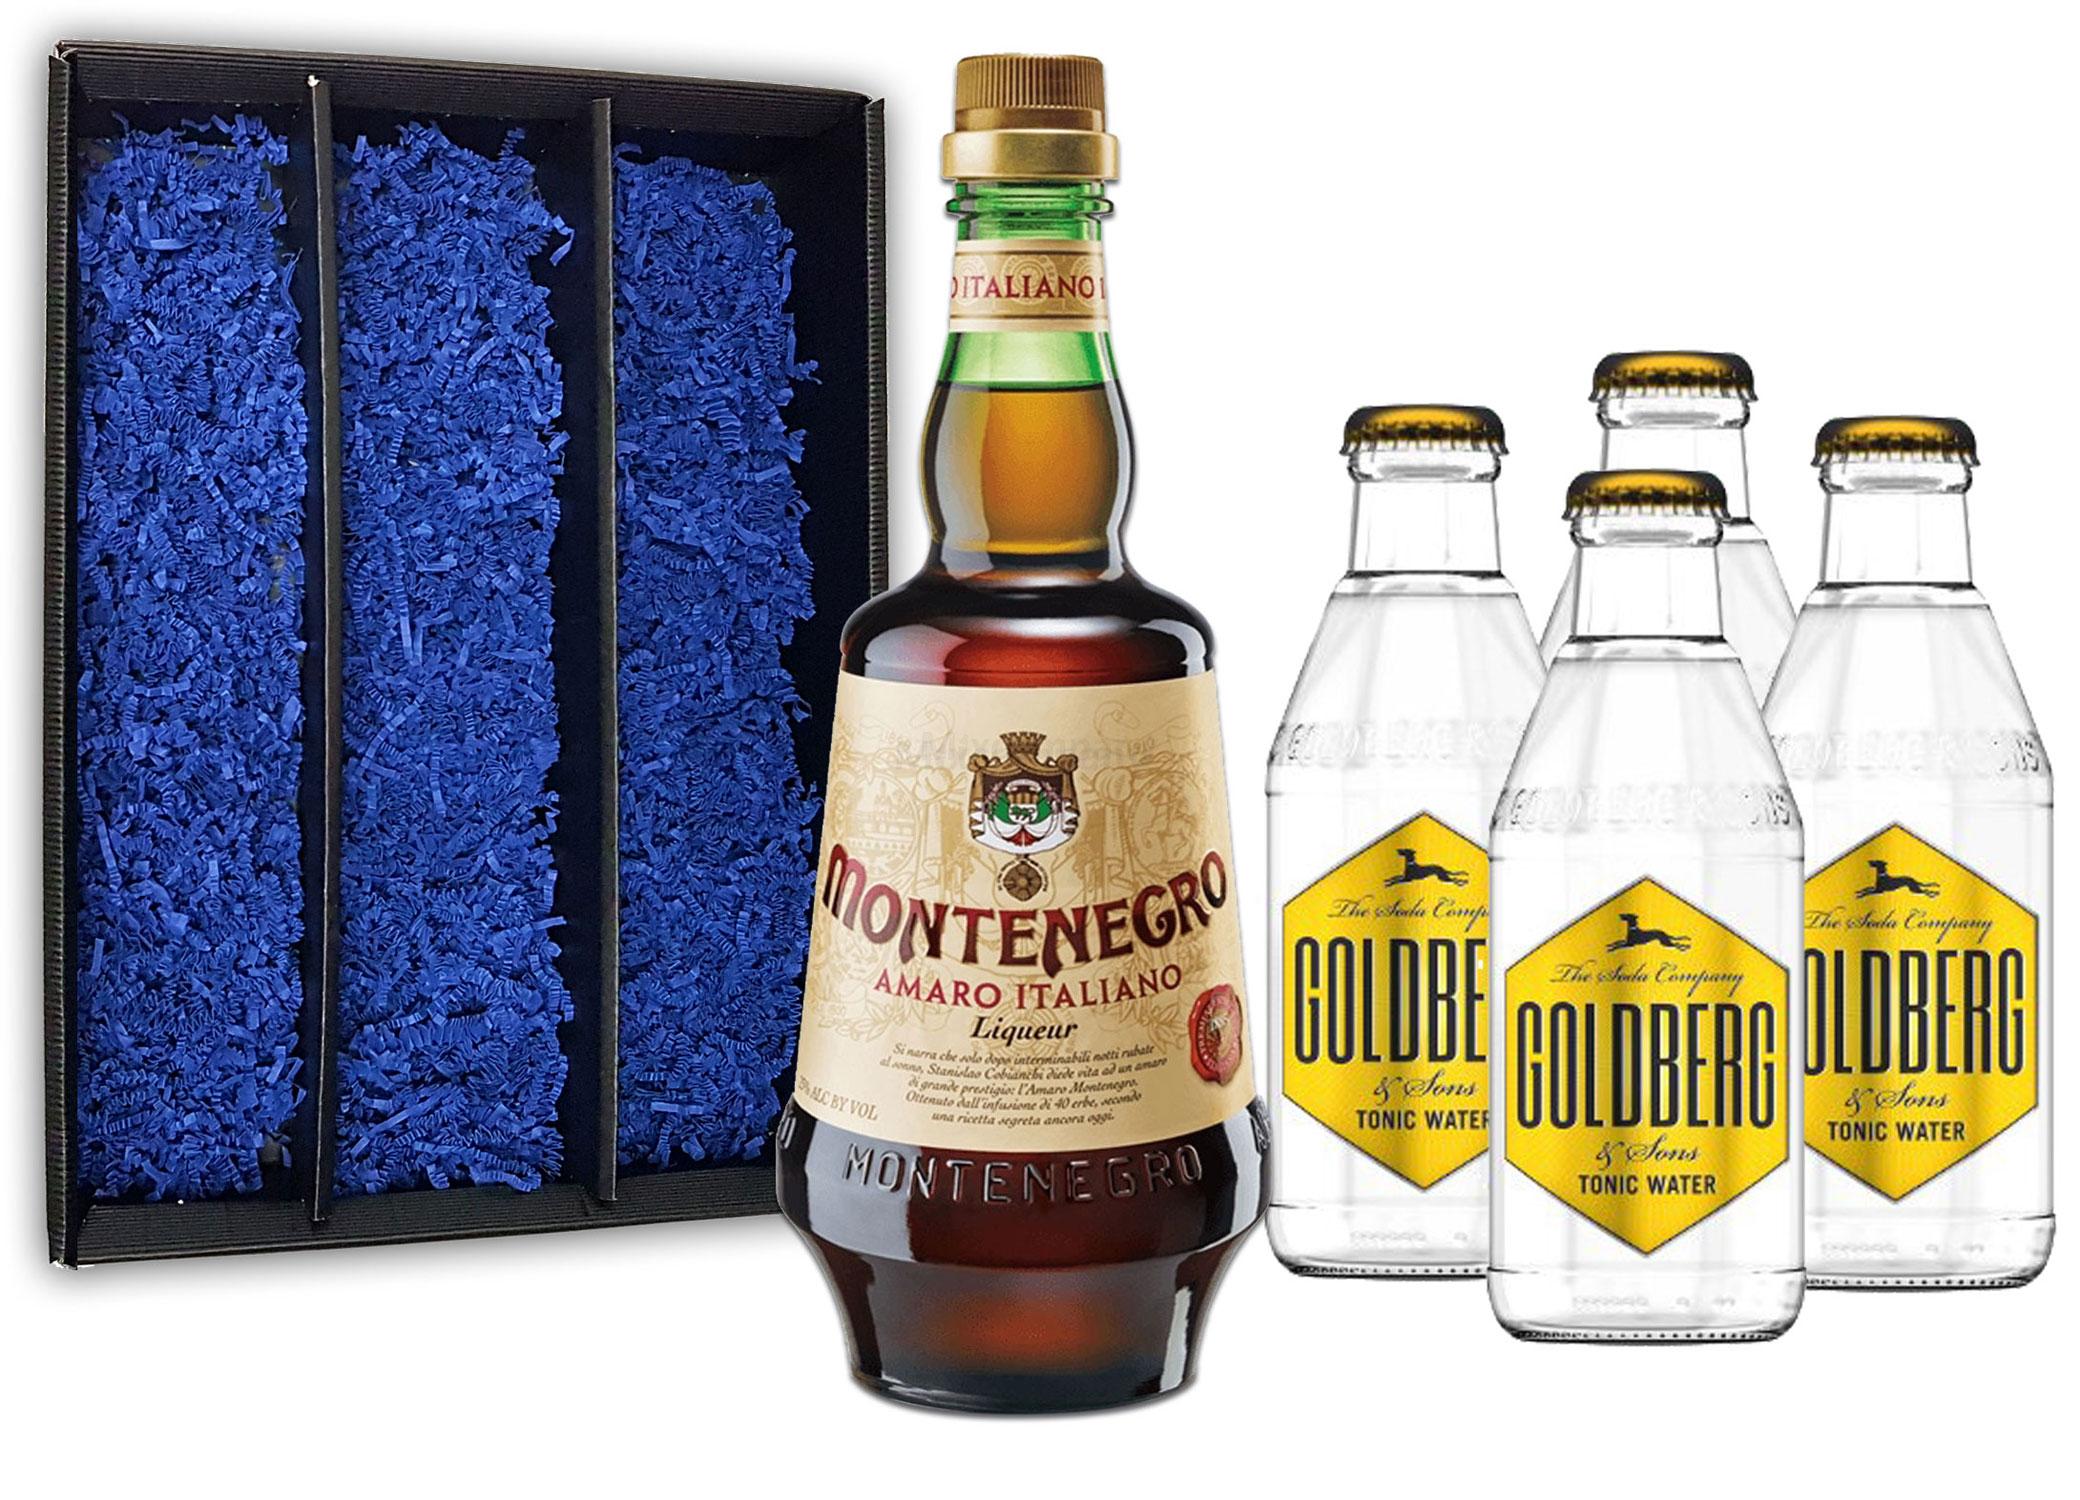 Montenegro & Tonic Geschenkset - Montenegro Amaro Italiano Likör 0,7L (23% Vol) + 4x Goldberg Tonic Water 200ml inkl. Pfand MEHRWEG